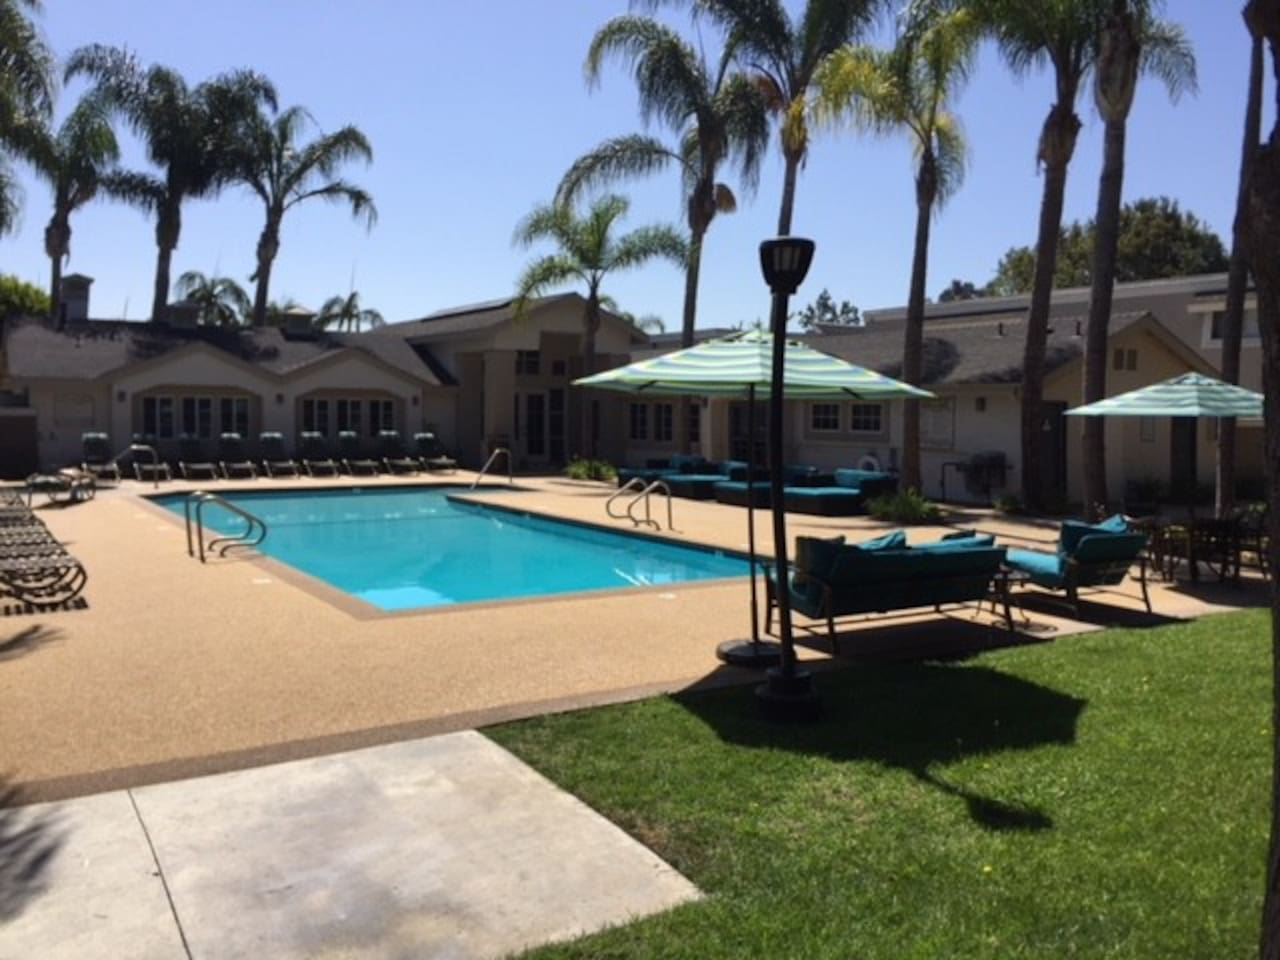 Pool & Barbecue Area